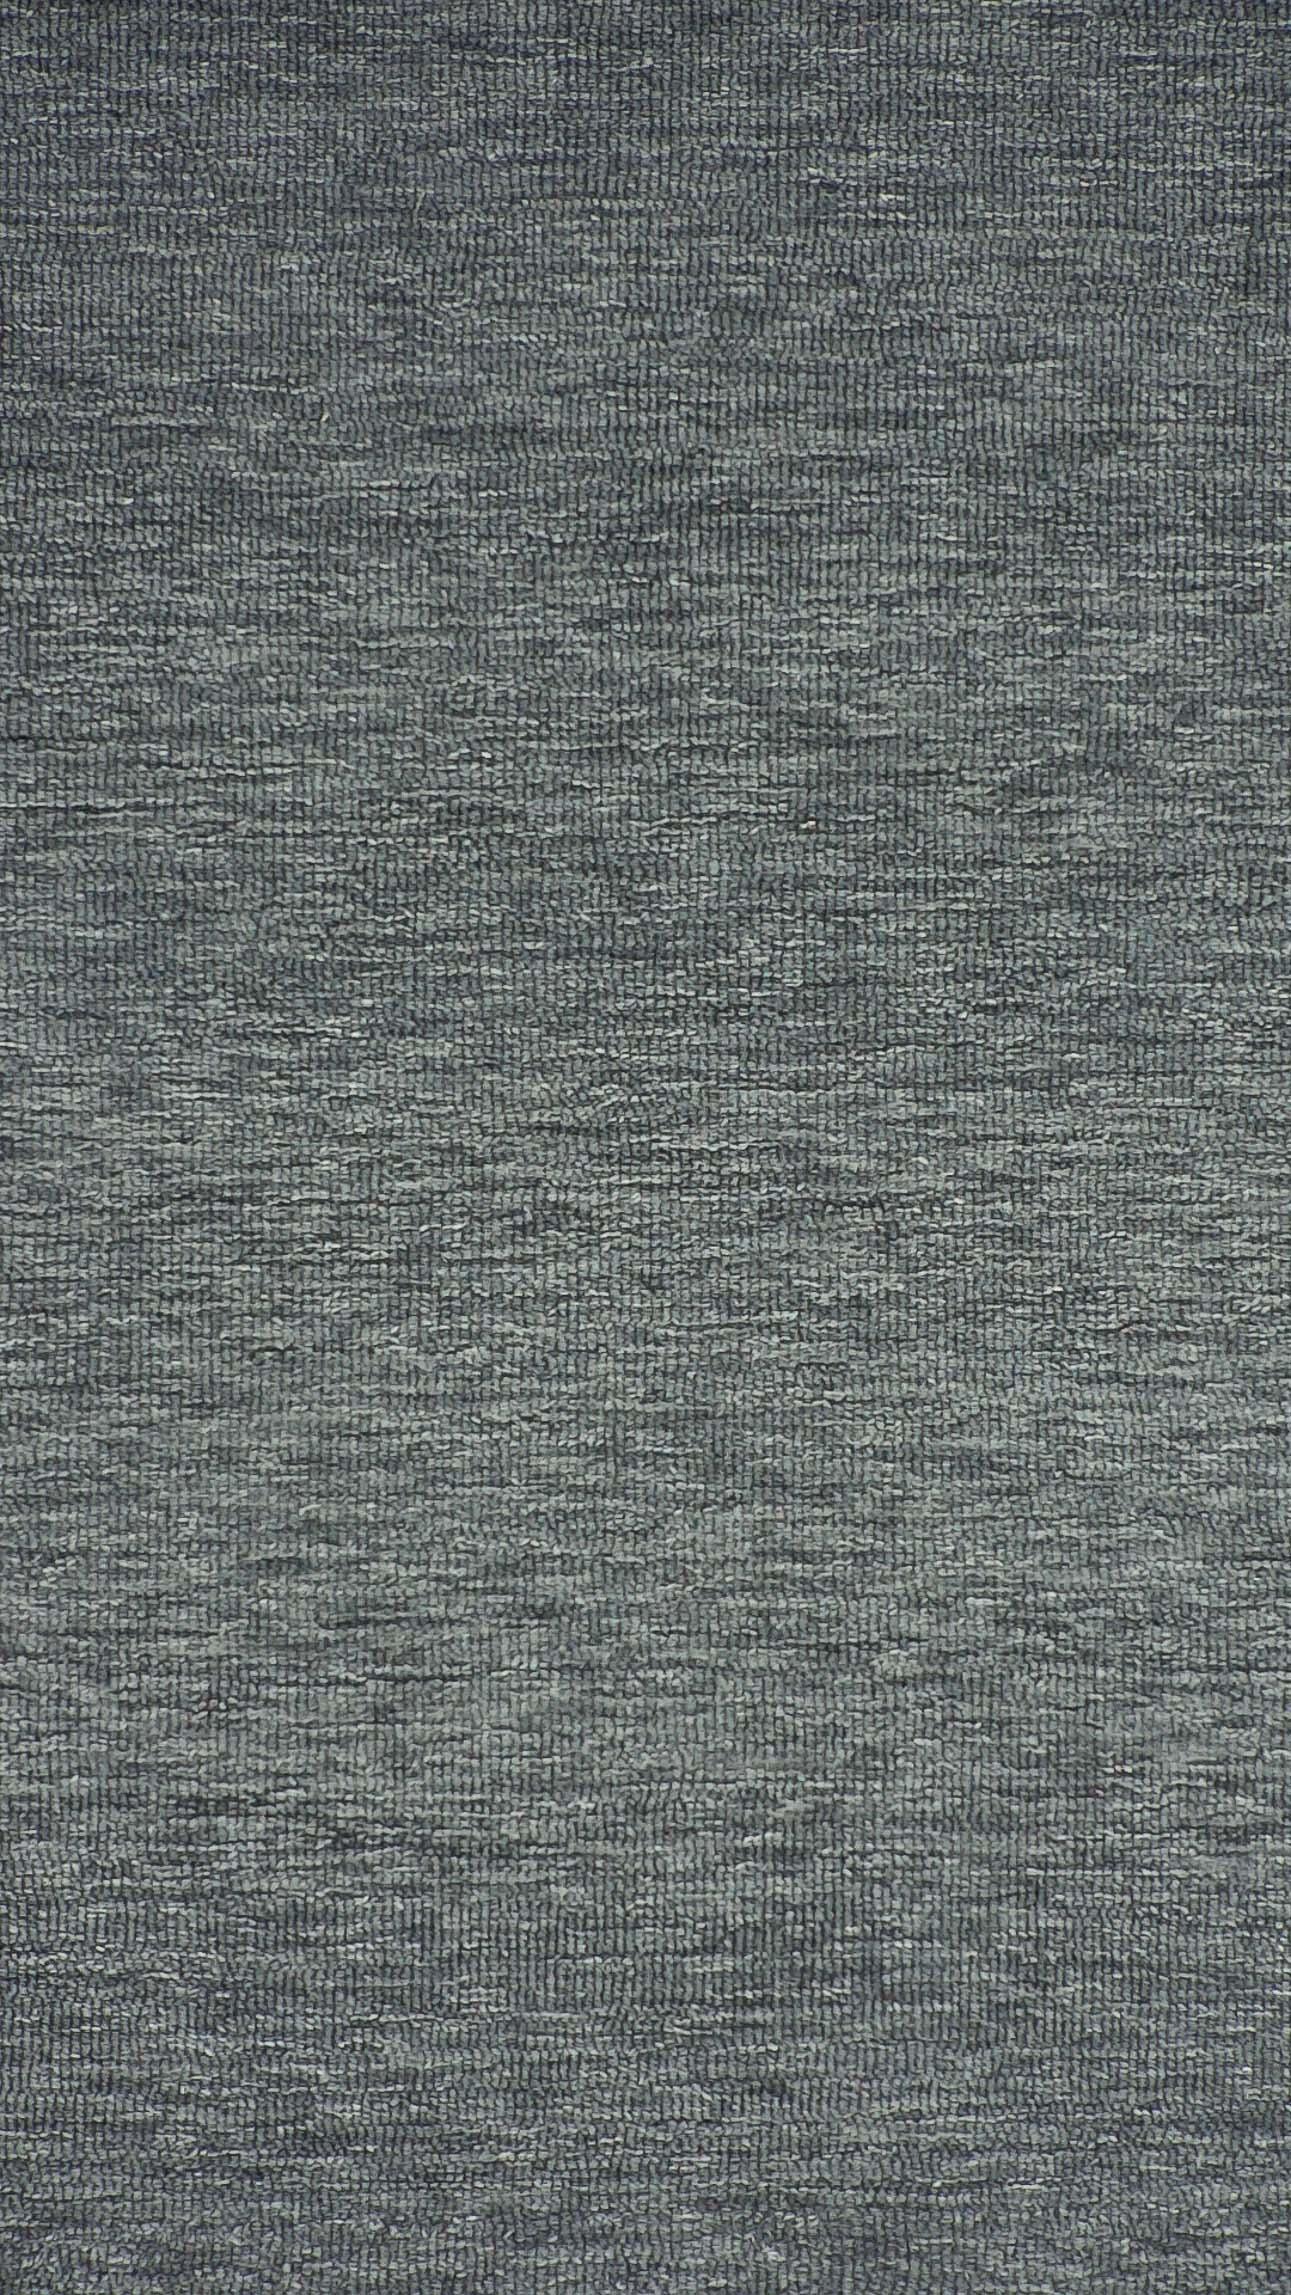 MARLC1_Marled_Coal_160x230-closeup